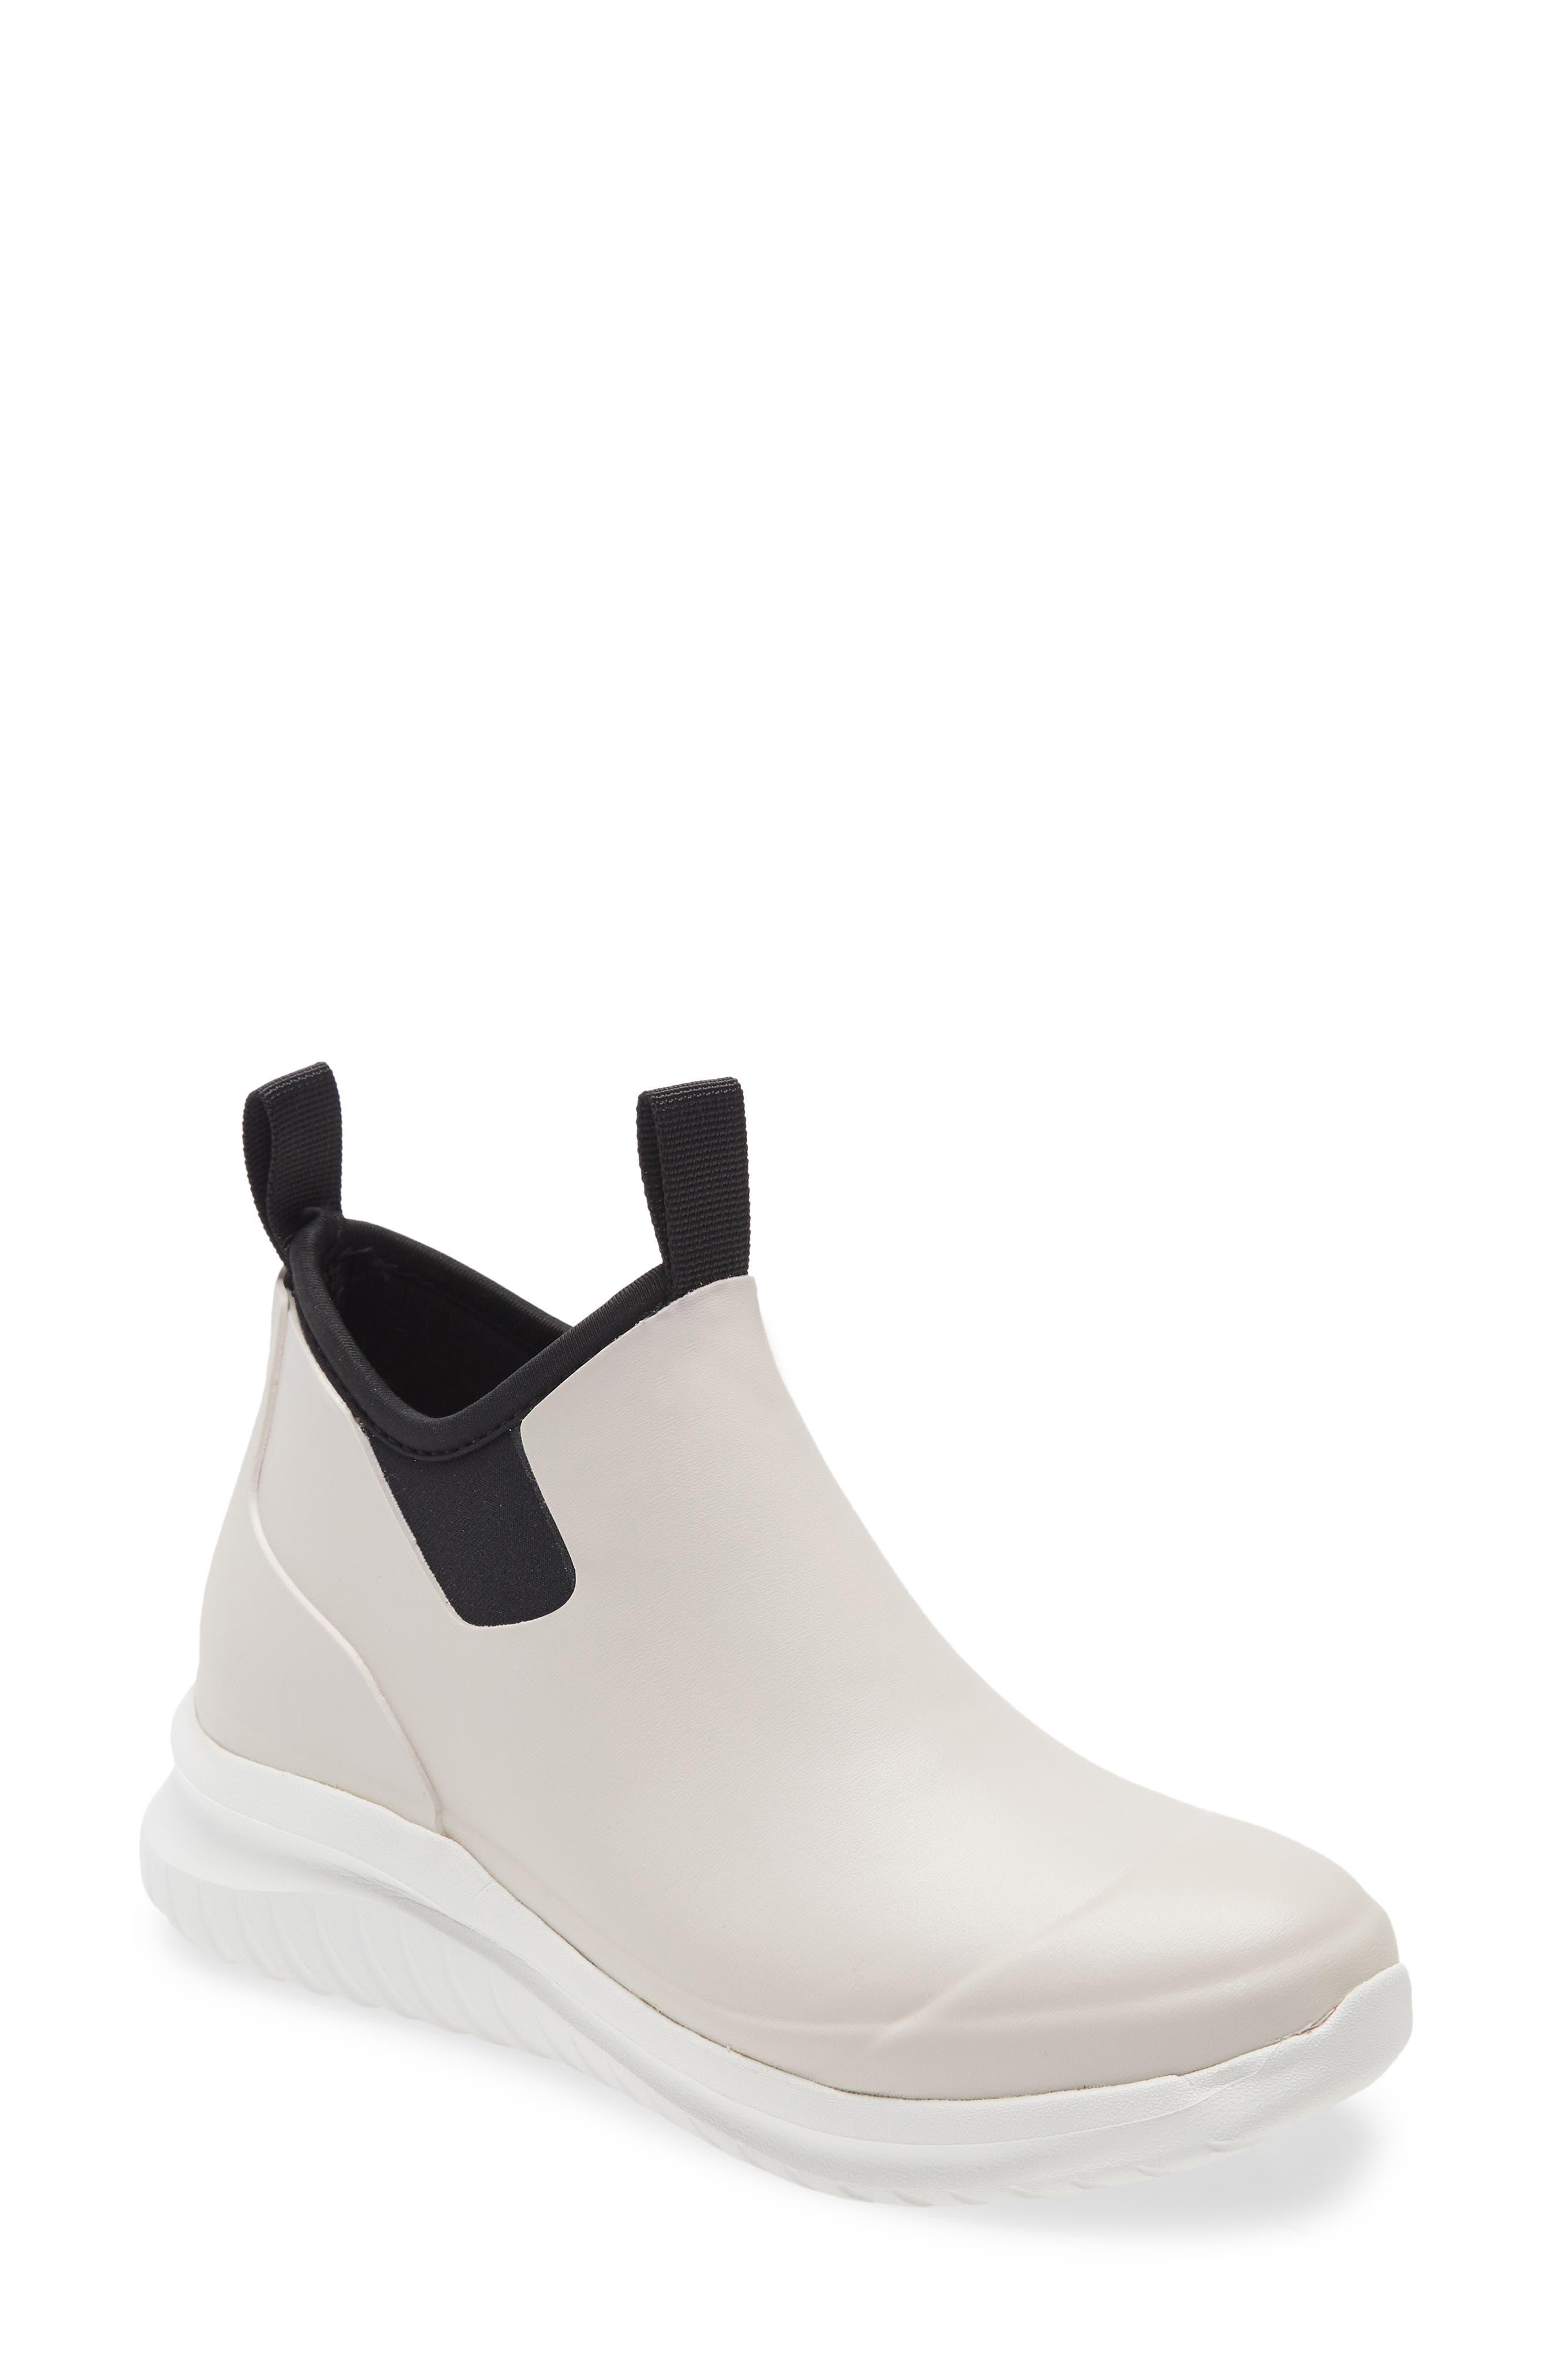 Bellevue Waterproof Rain Sneaker